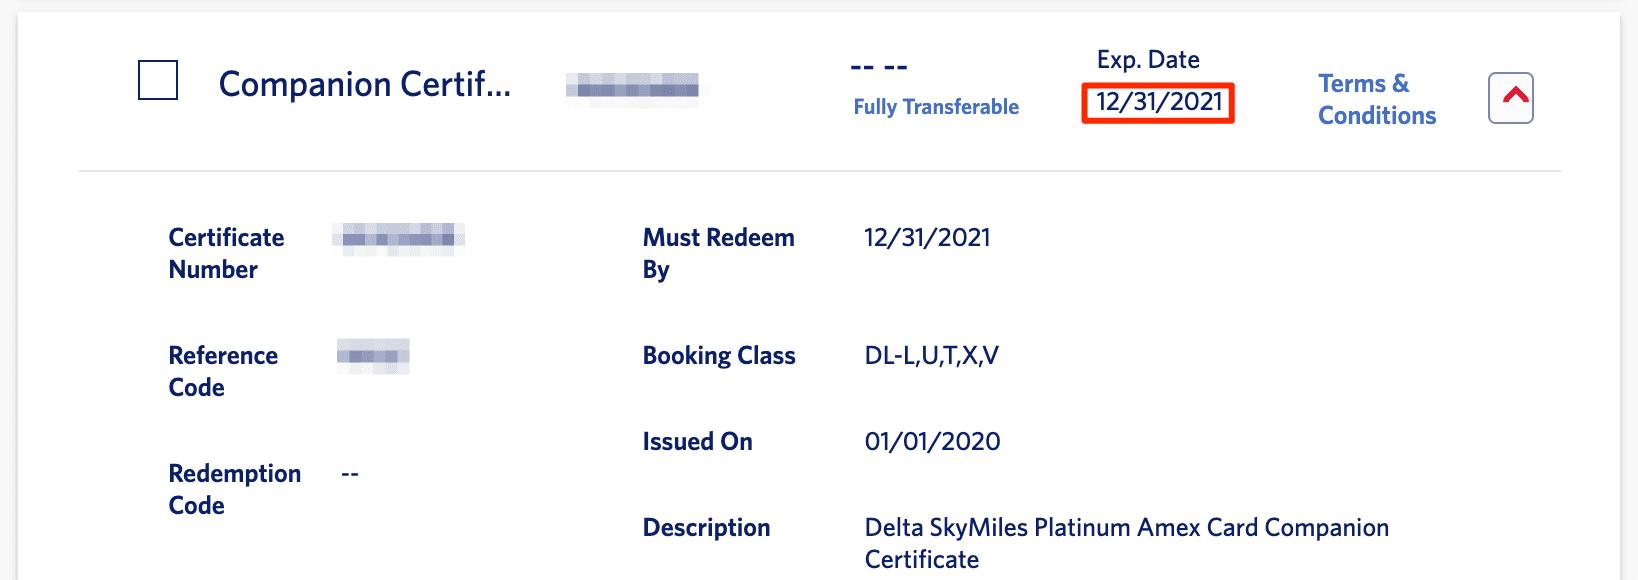 delta extending companion certificates